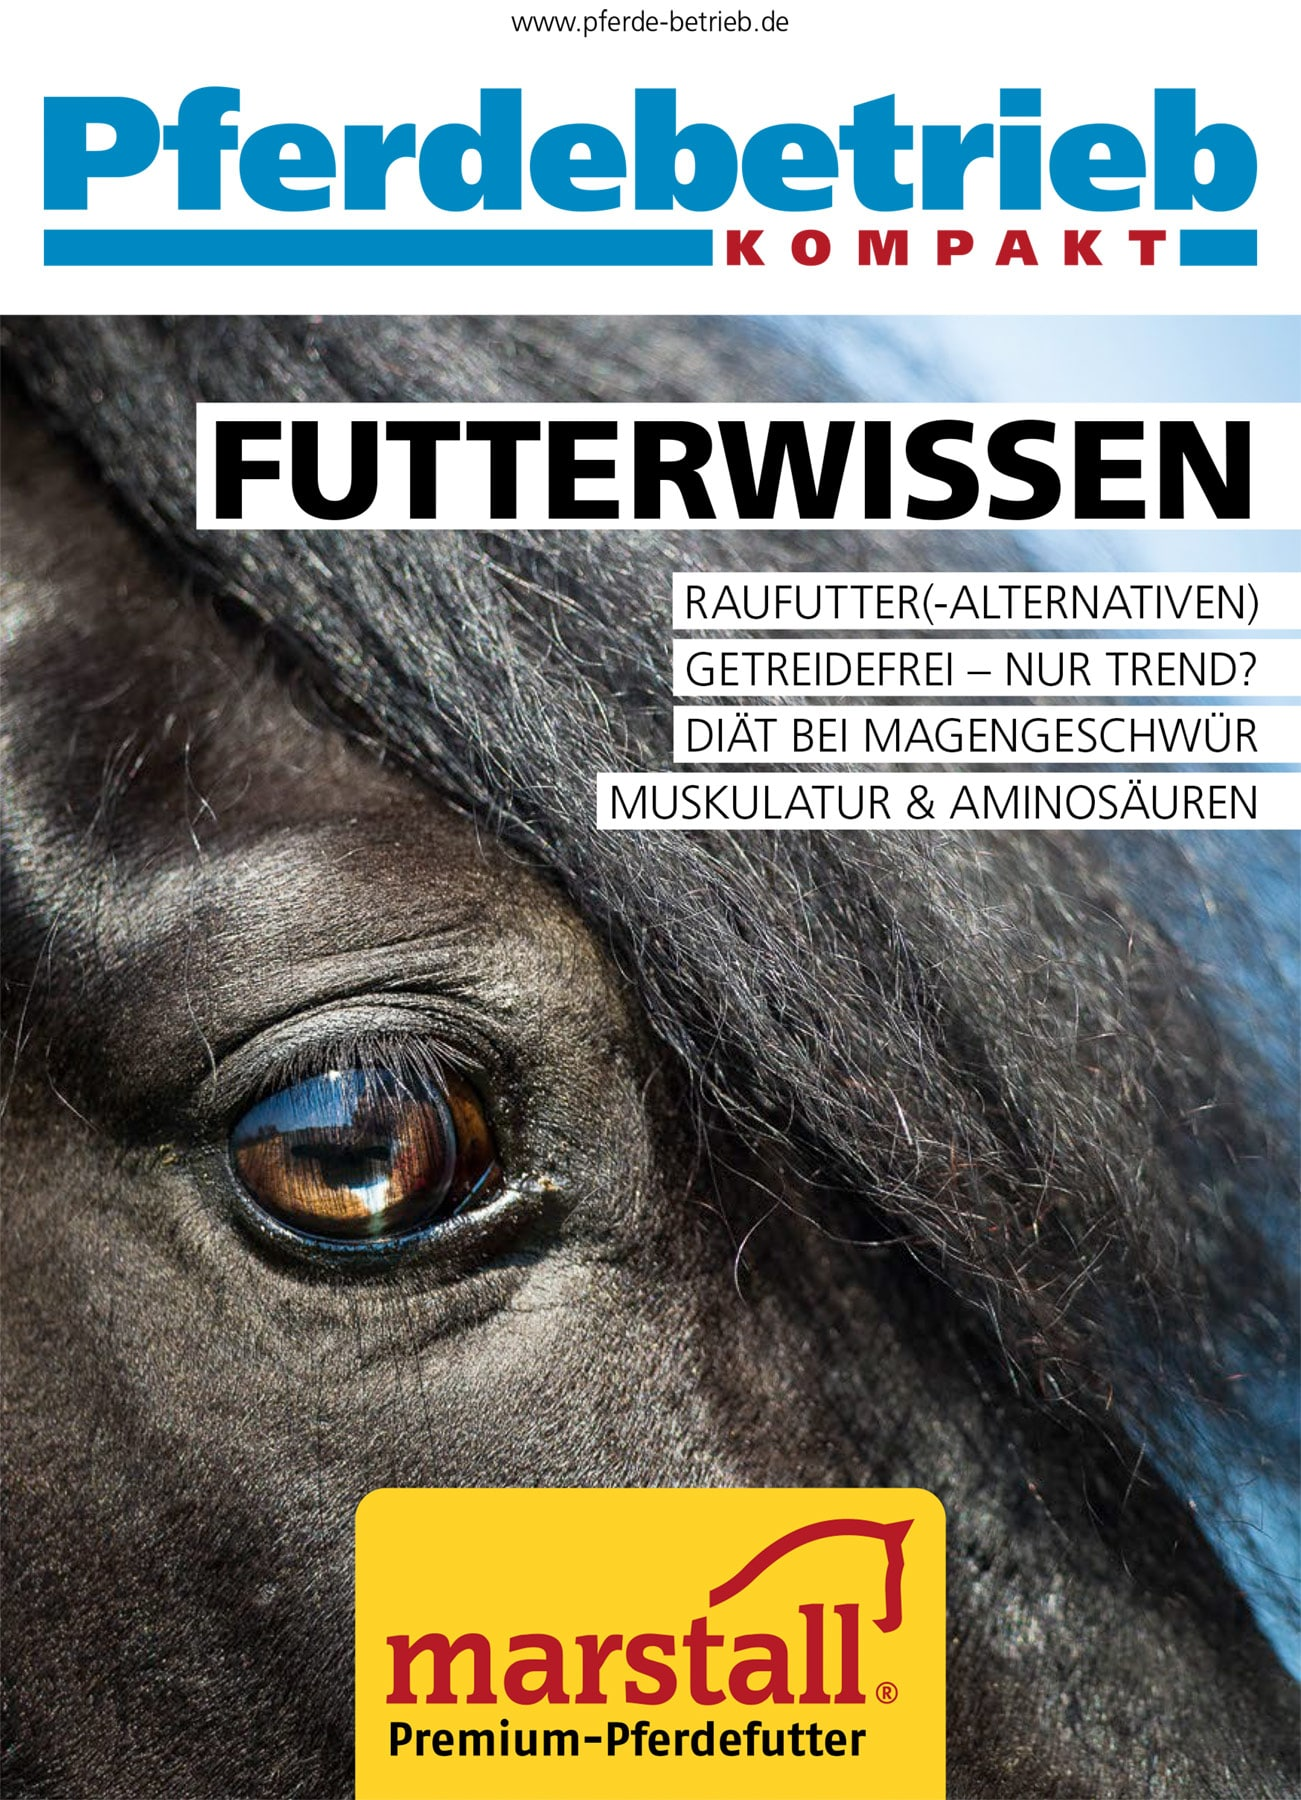 Cover_Pferdebetrieb_Kompakt_marstall